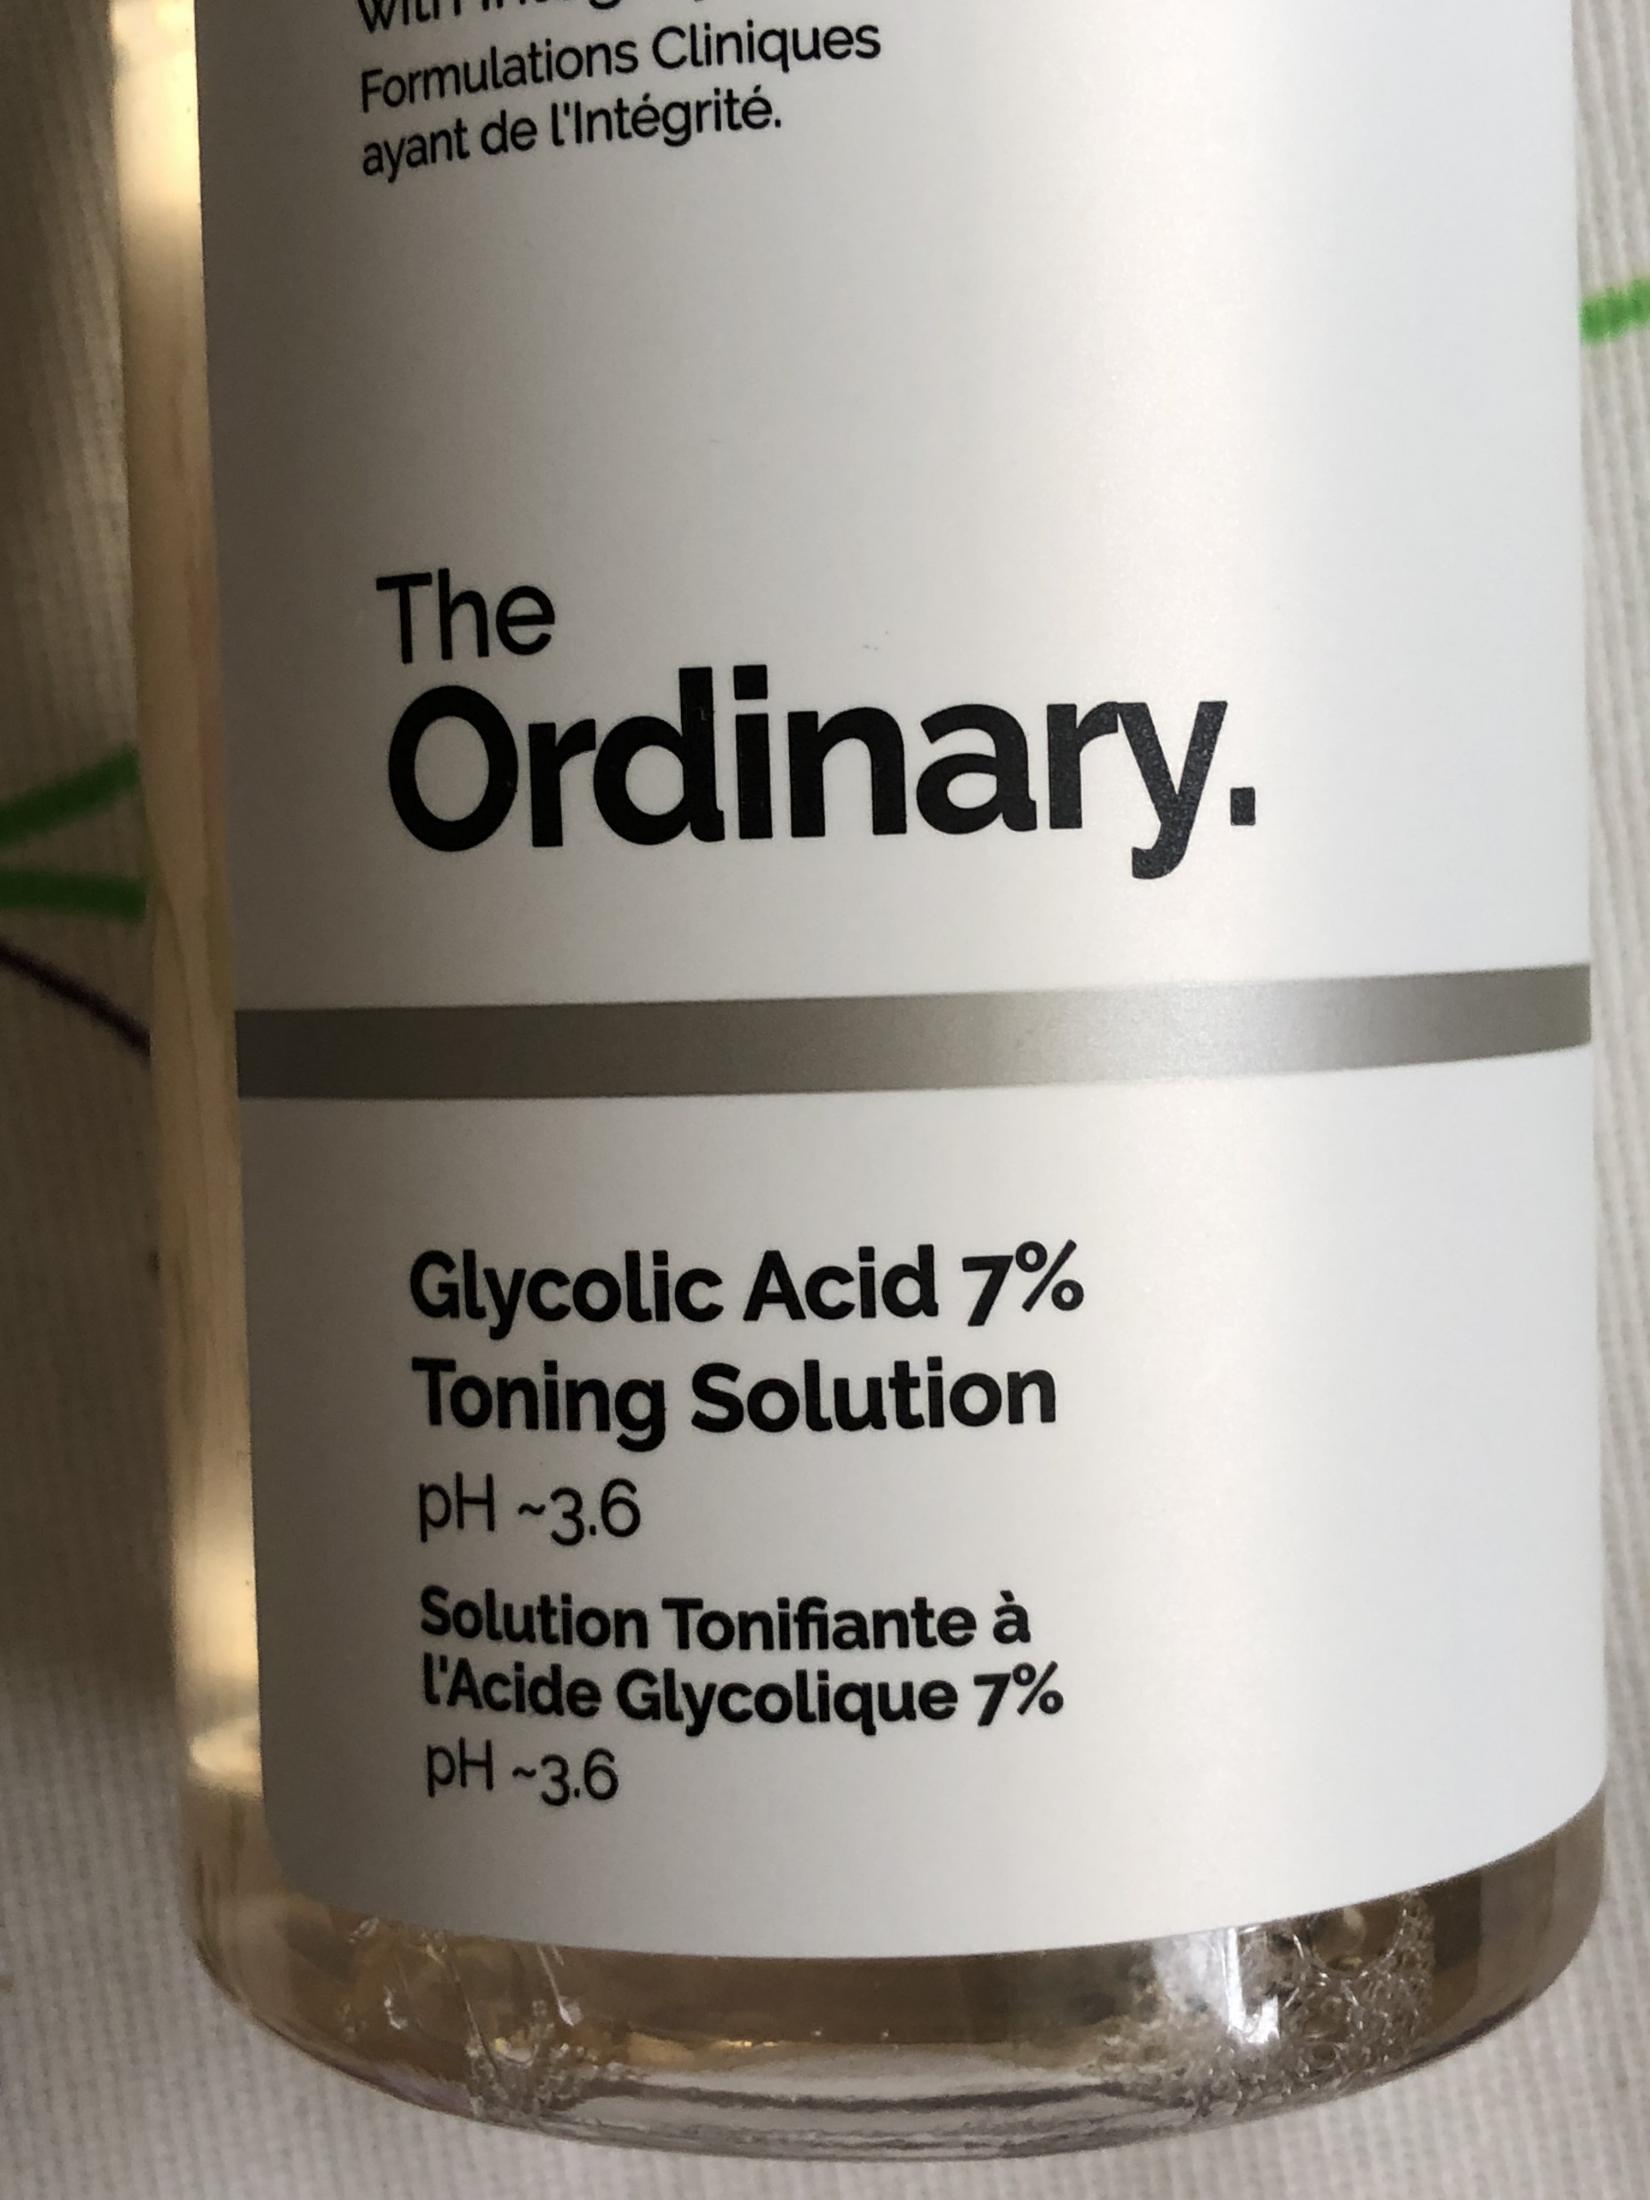 The Ordinary Glycolic Acid 7% Toning Solution. Крупный план